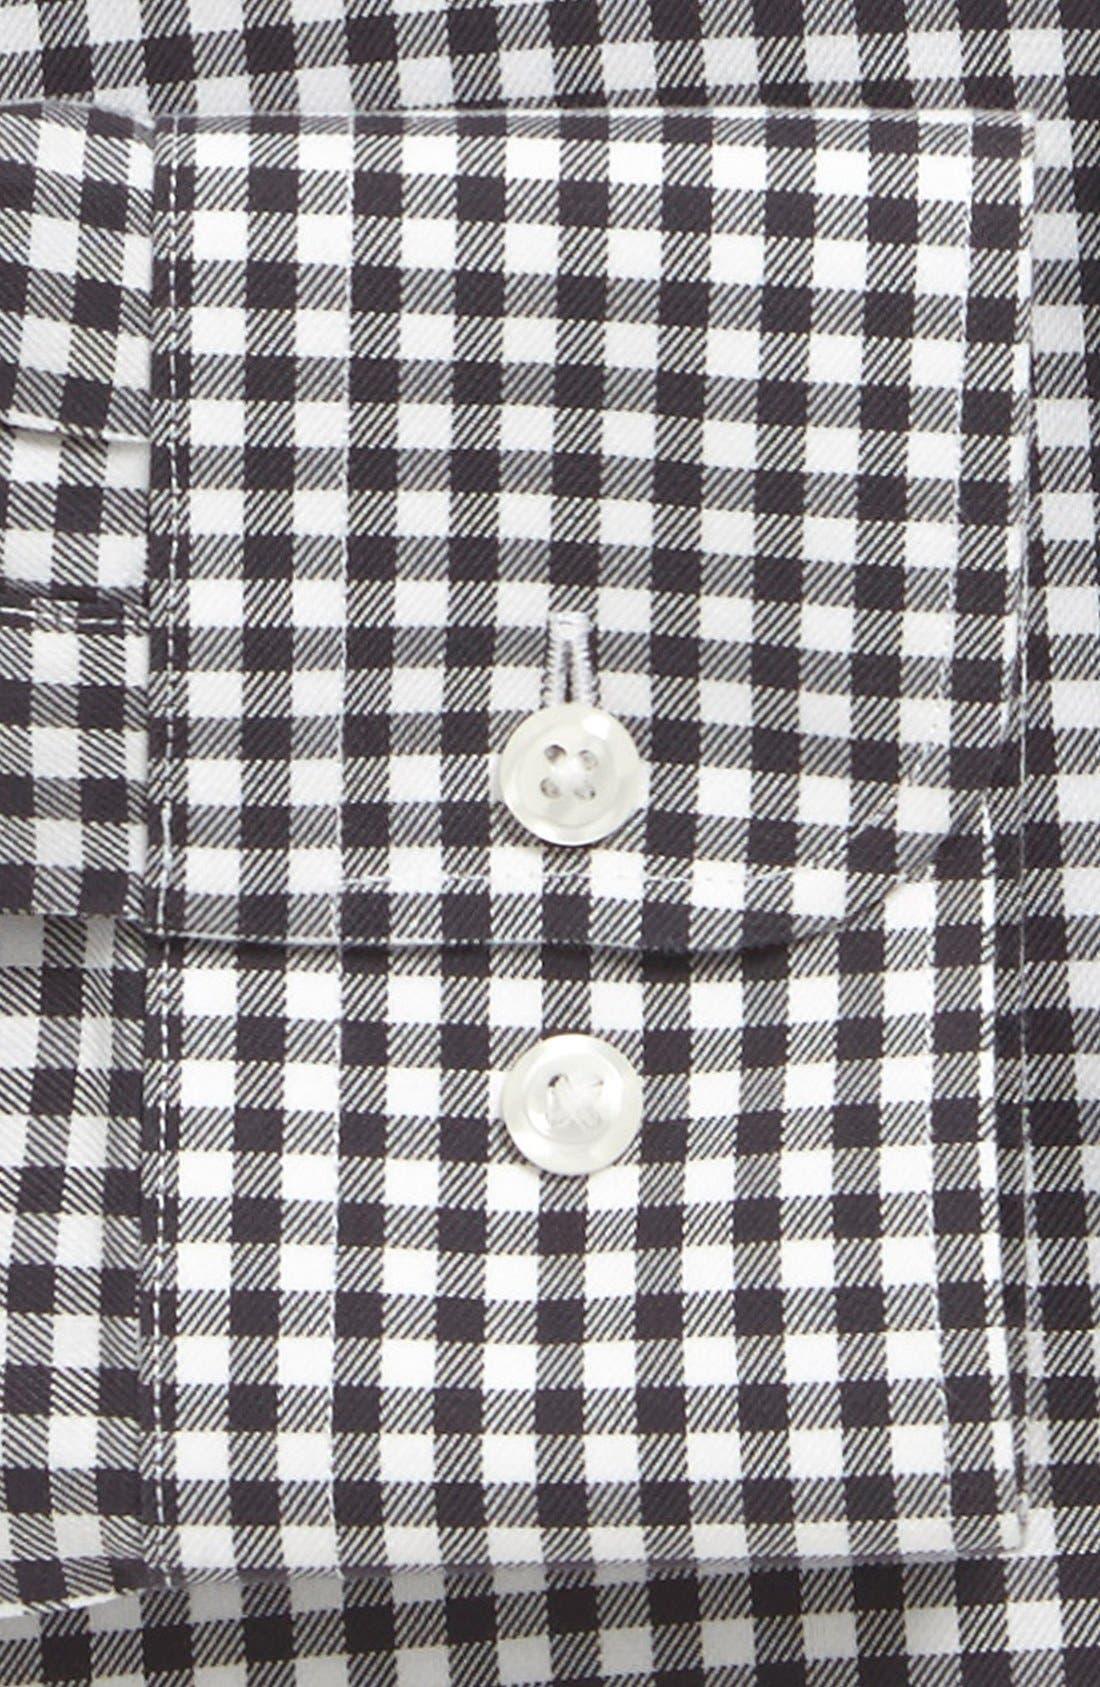 NORDSTROM MEN'S SHOP, Nordstrom Smartcare<sup>™</sup> Wrinkle Free Trim Fit Dress Shirt, Alternate thumbnail 2, color, 021